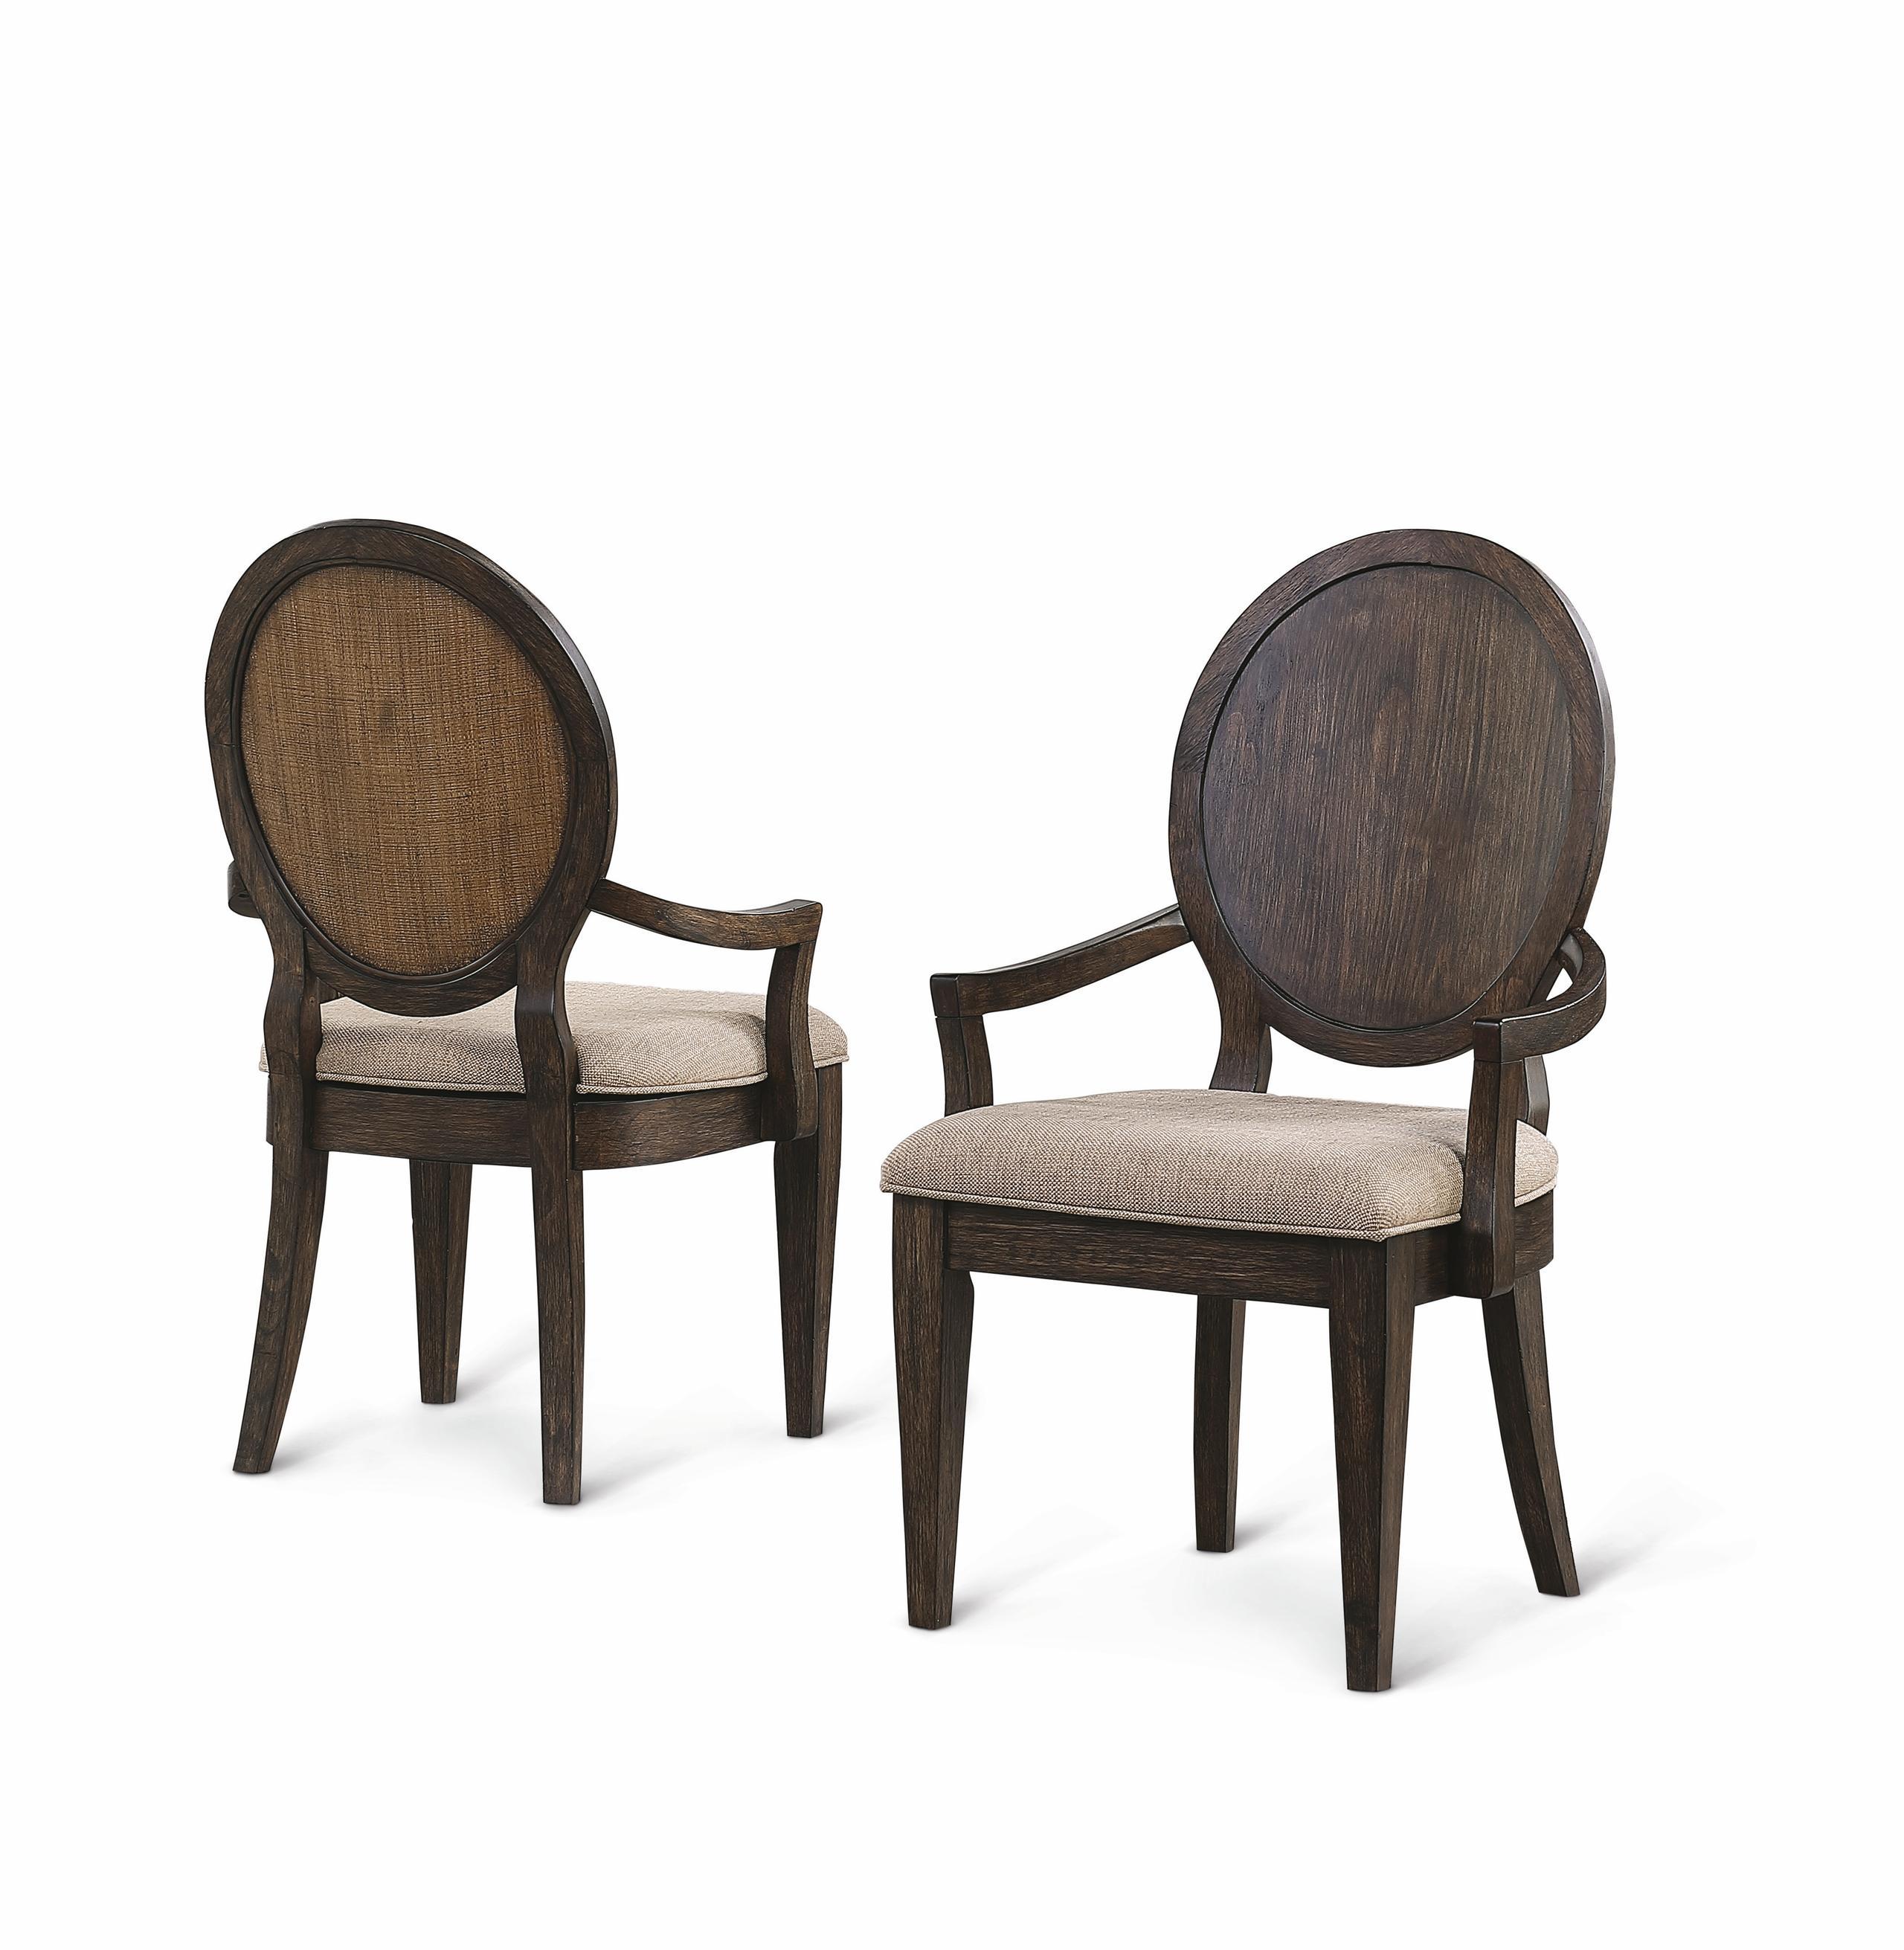 FlexsteelWakefield Upholstered Arm Dining Chair